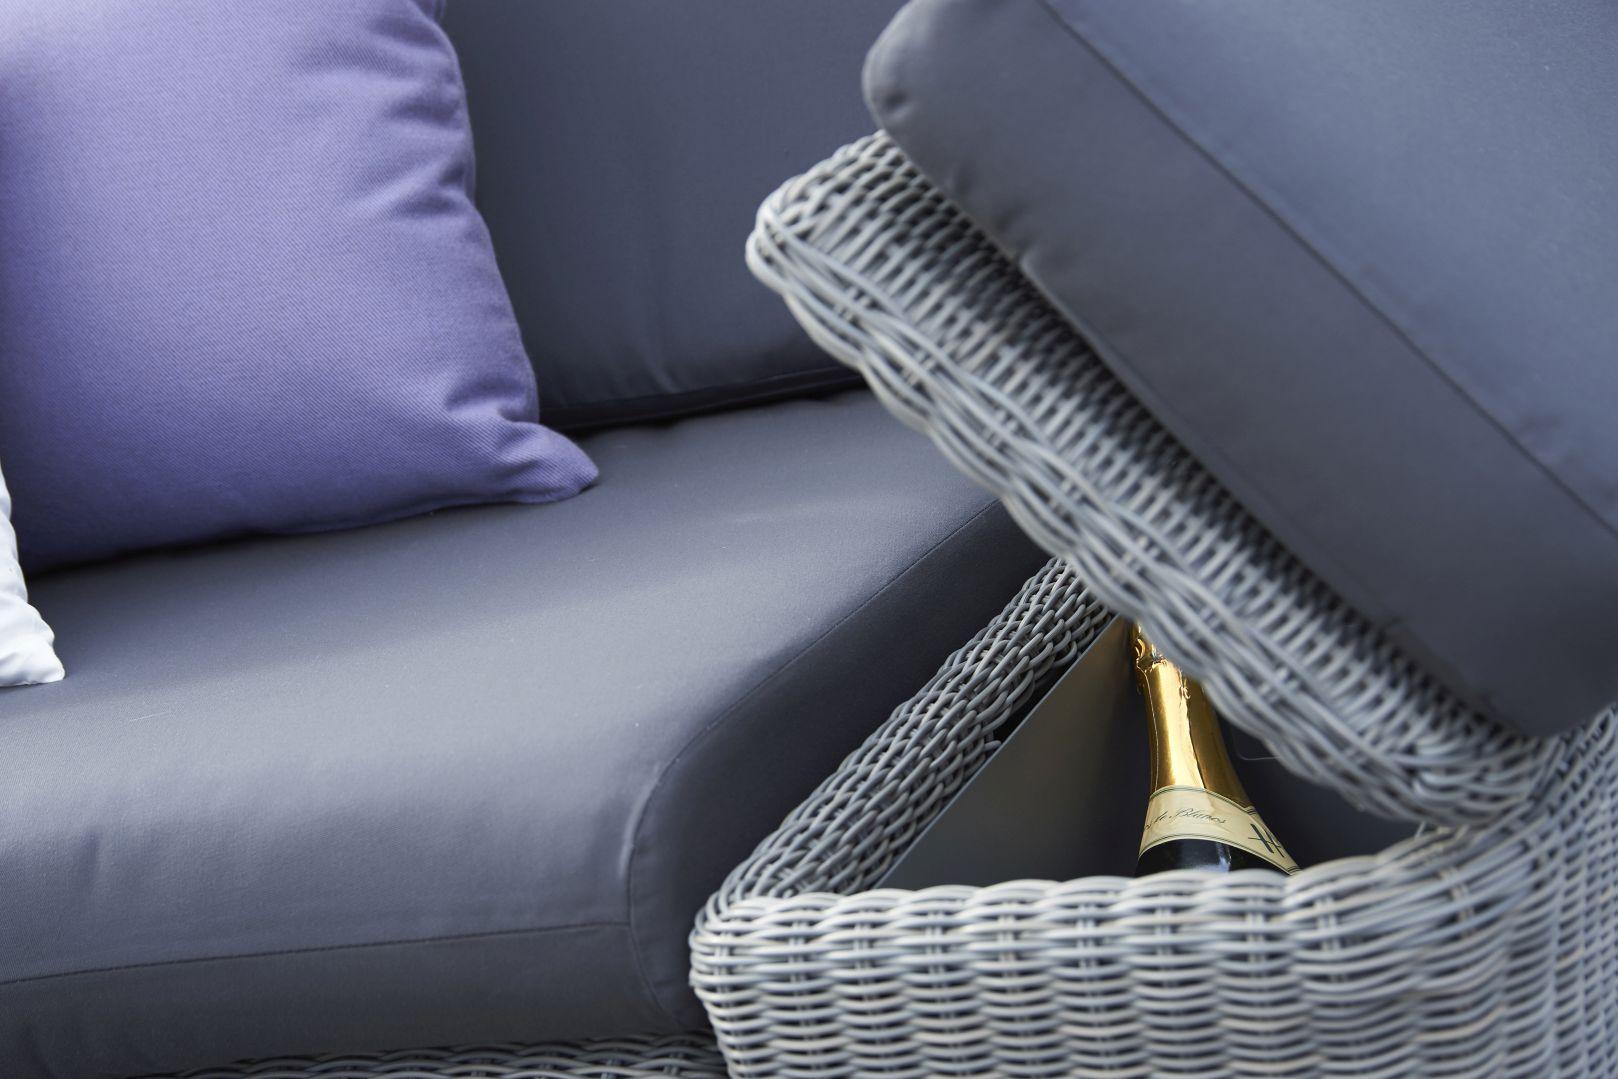 17bridgmanspring-garden-_-rattan-national-trust-cliveden-modular-armrest.jpg